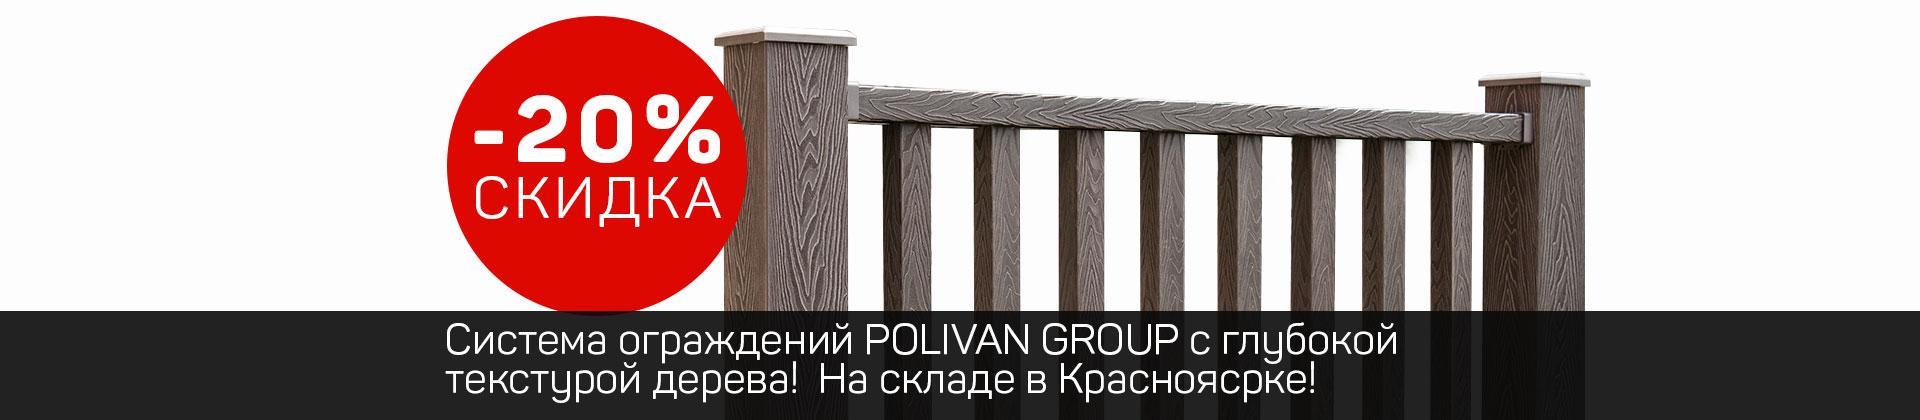 polivan-group-ograda-20-skidka